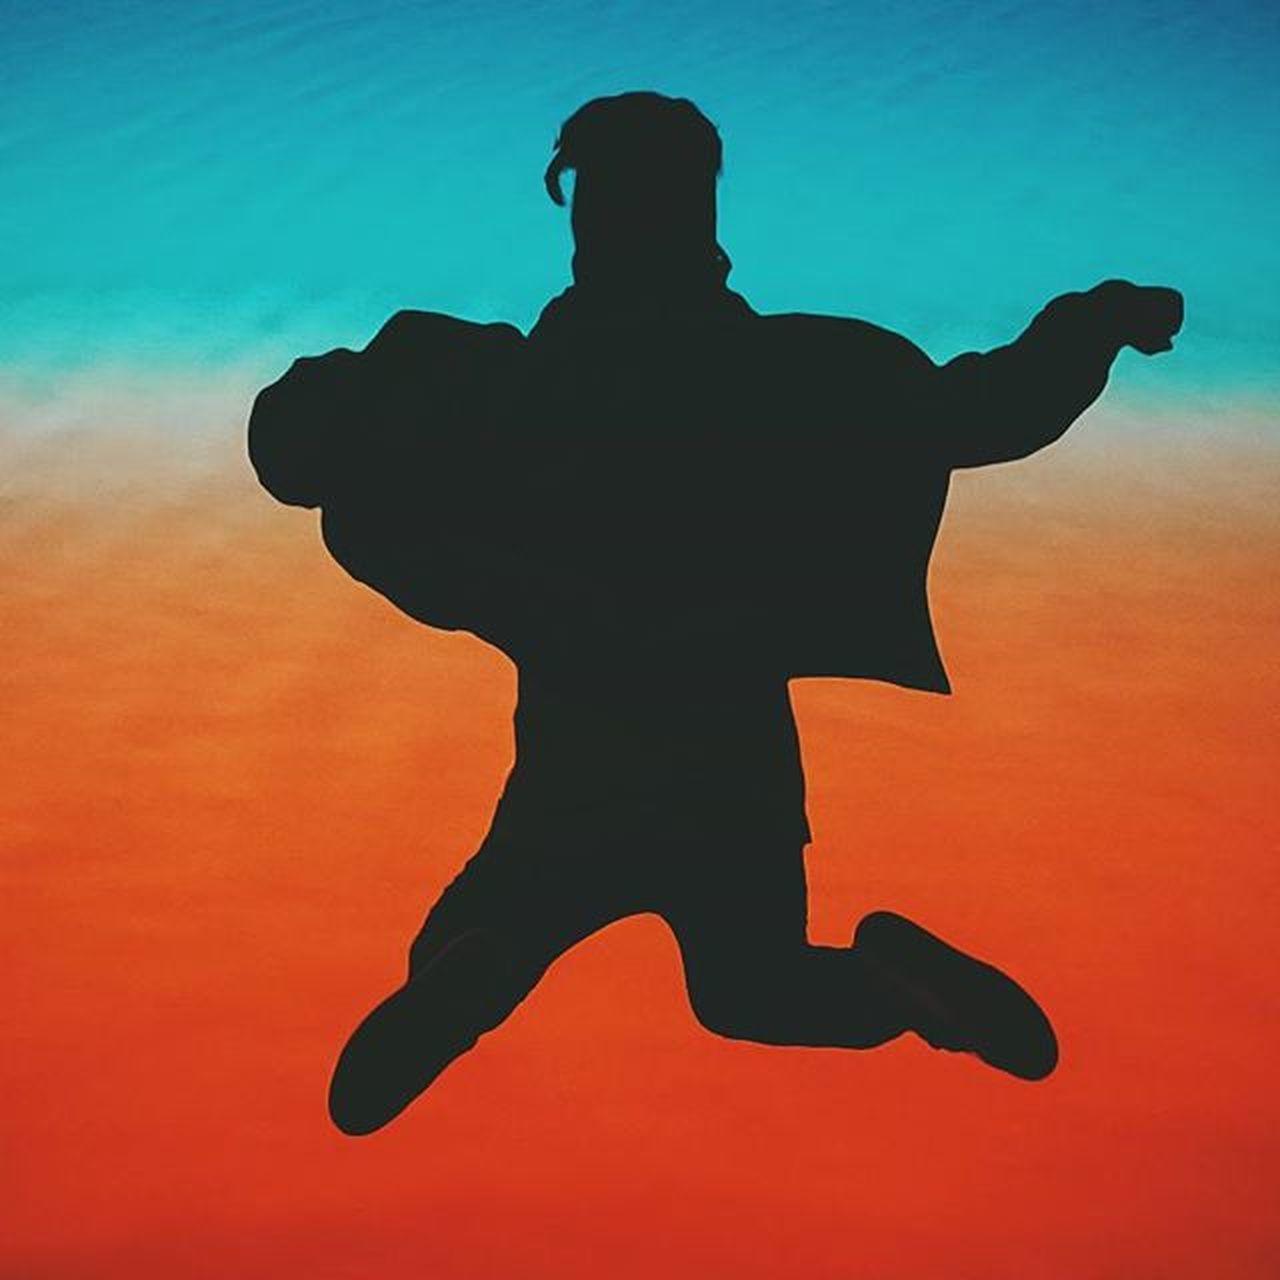 Jumpstagram! Vscocam Jumpstagram Gradient Colorful _soi Peoplescreatives Liveauthentic Livefolk Photooftheday Igers Socality Indiaclicks Igersworldwide Wearevsco Vscolife Vscogang Vscouser Vscodailydose Vscocamonly VSCO Vscogallery Vscocollections Vscomood Vscobest